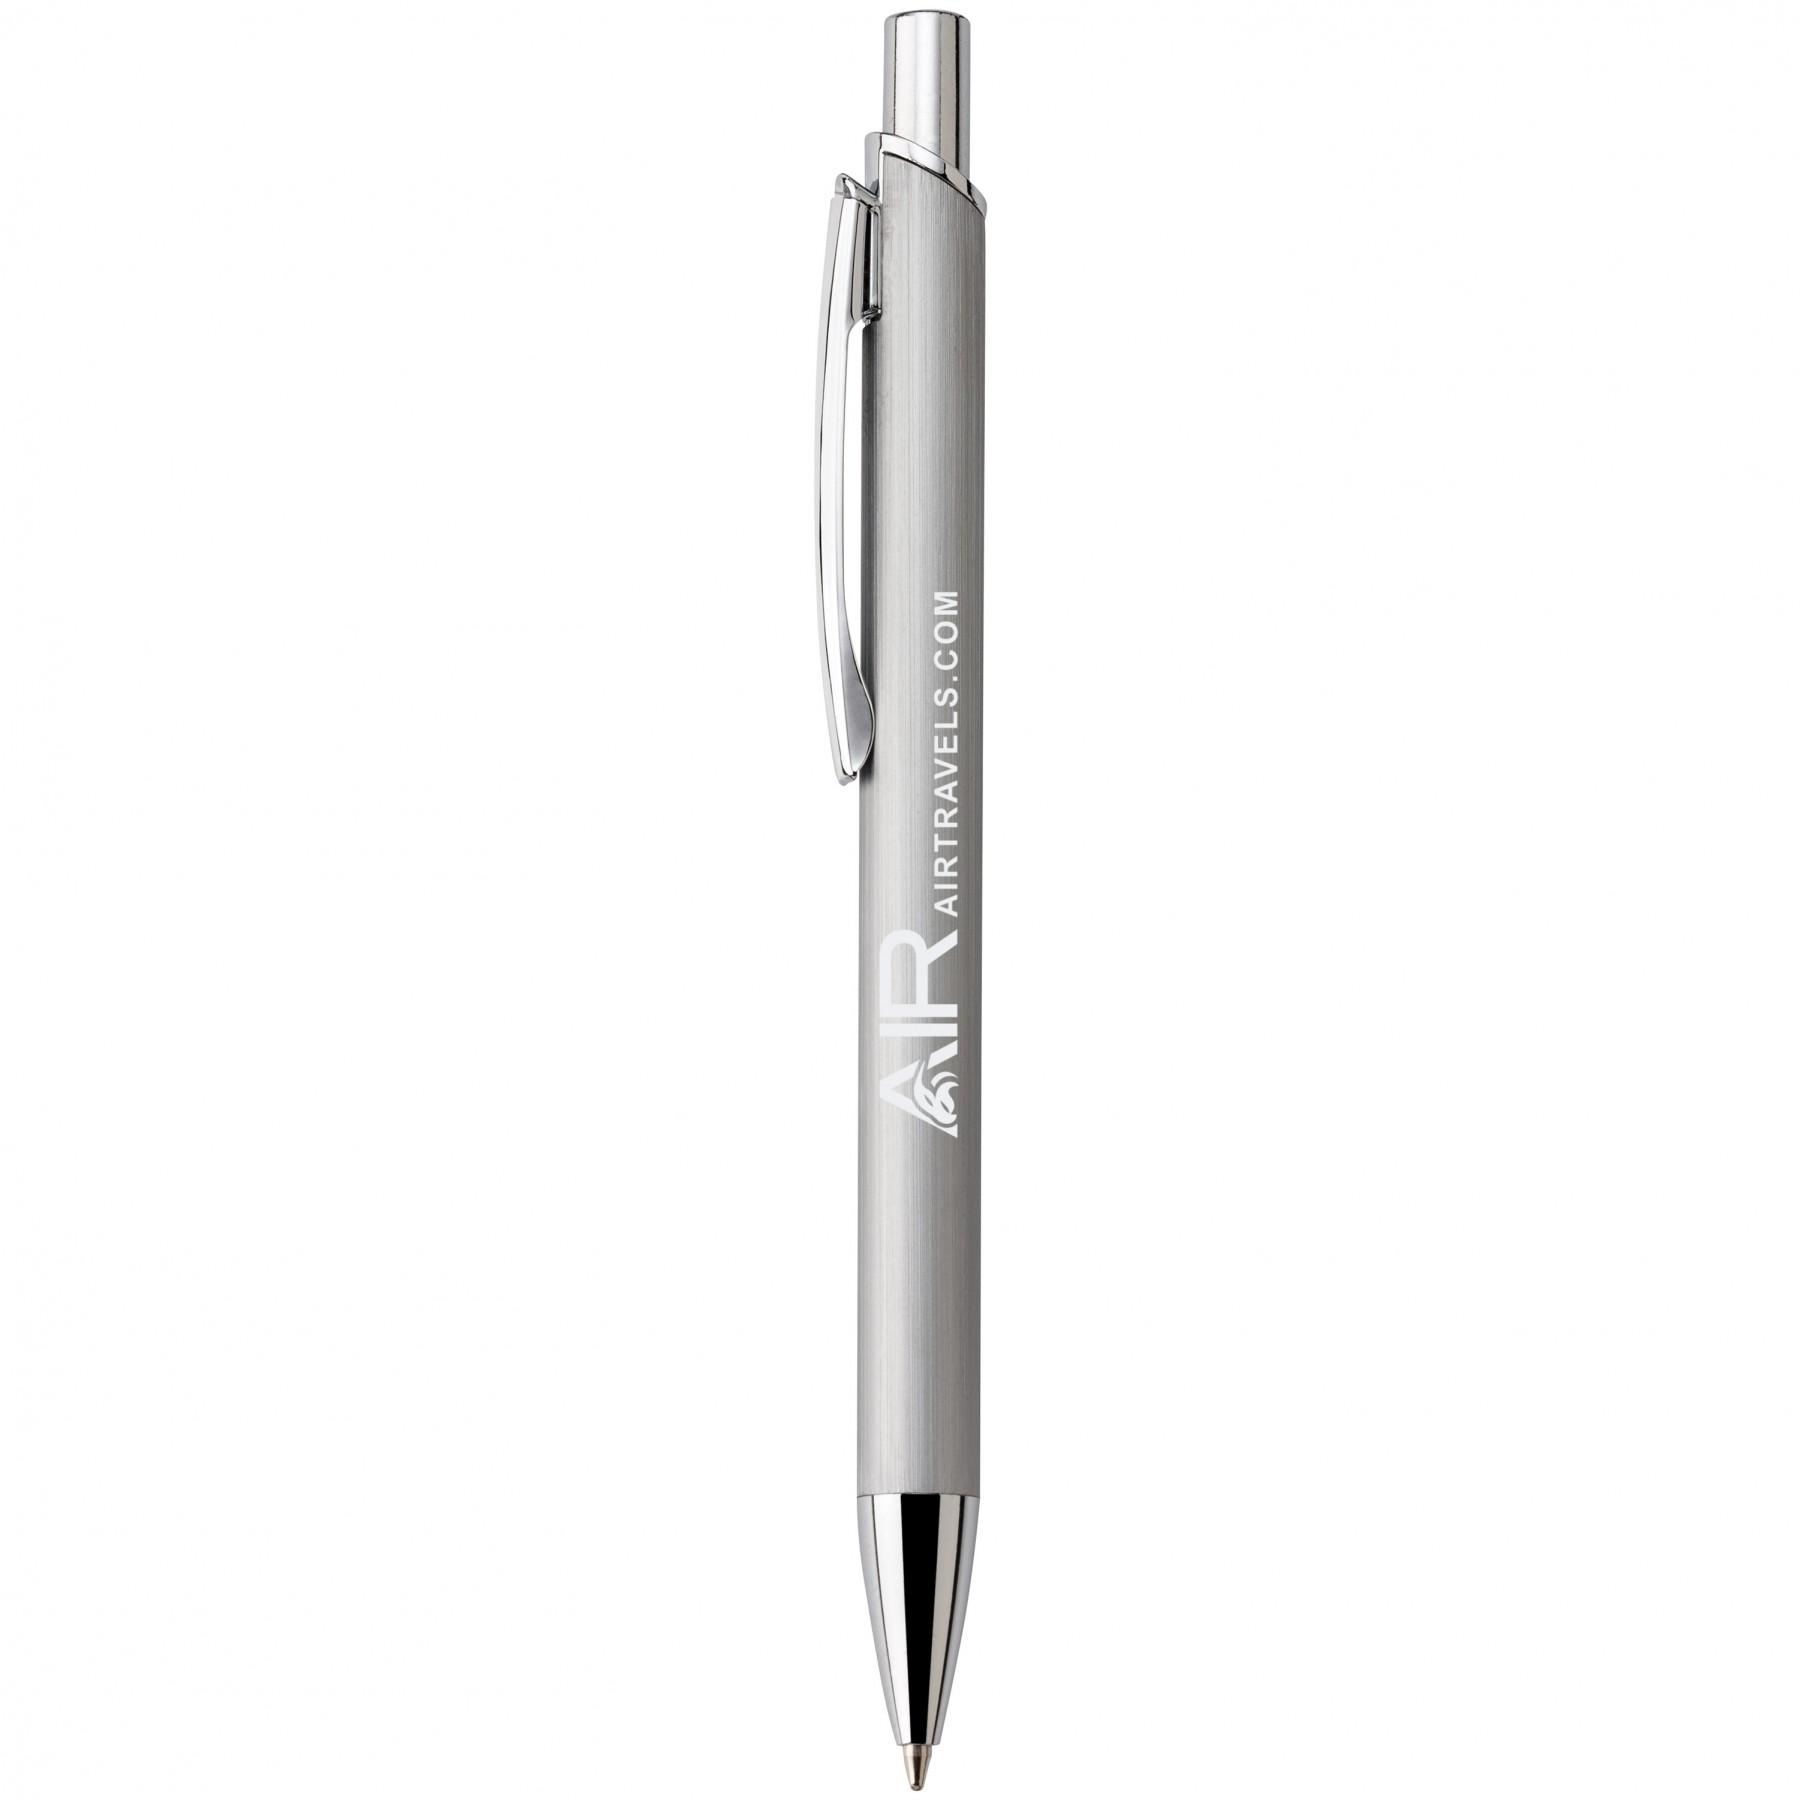 Chief Ballpoint Pen - Laser Engraved (G3007)